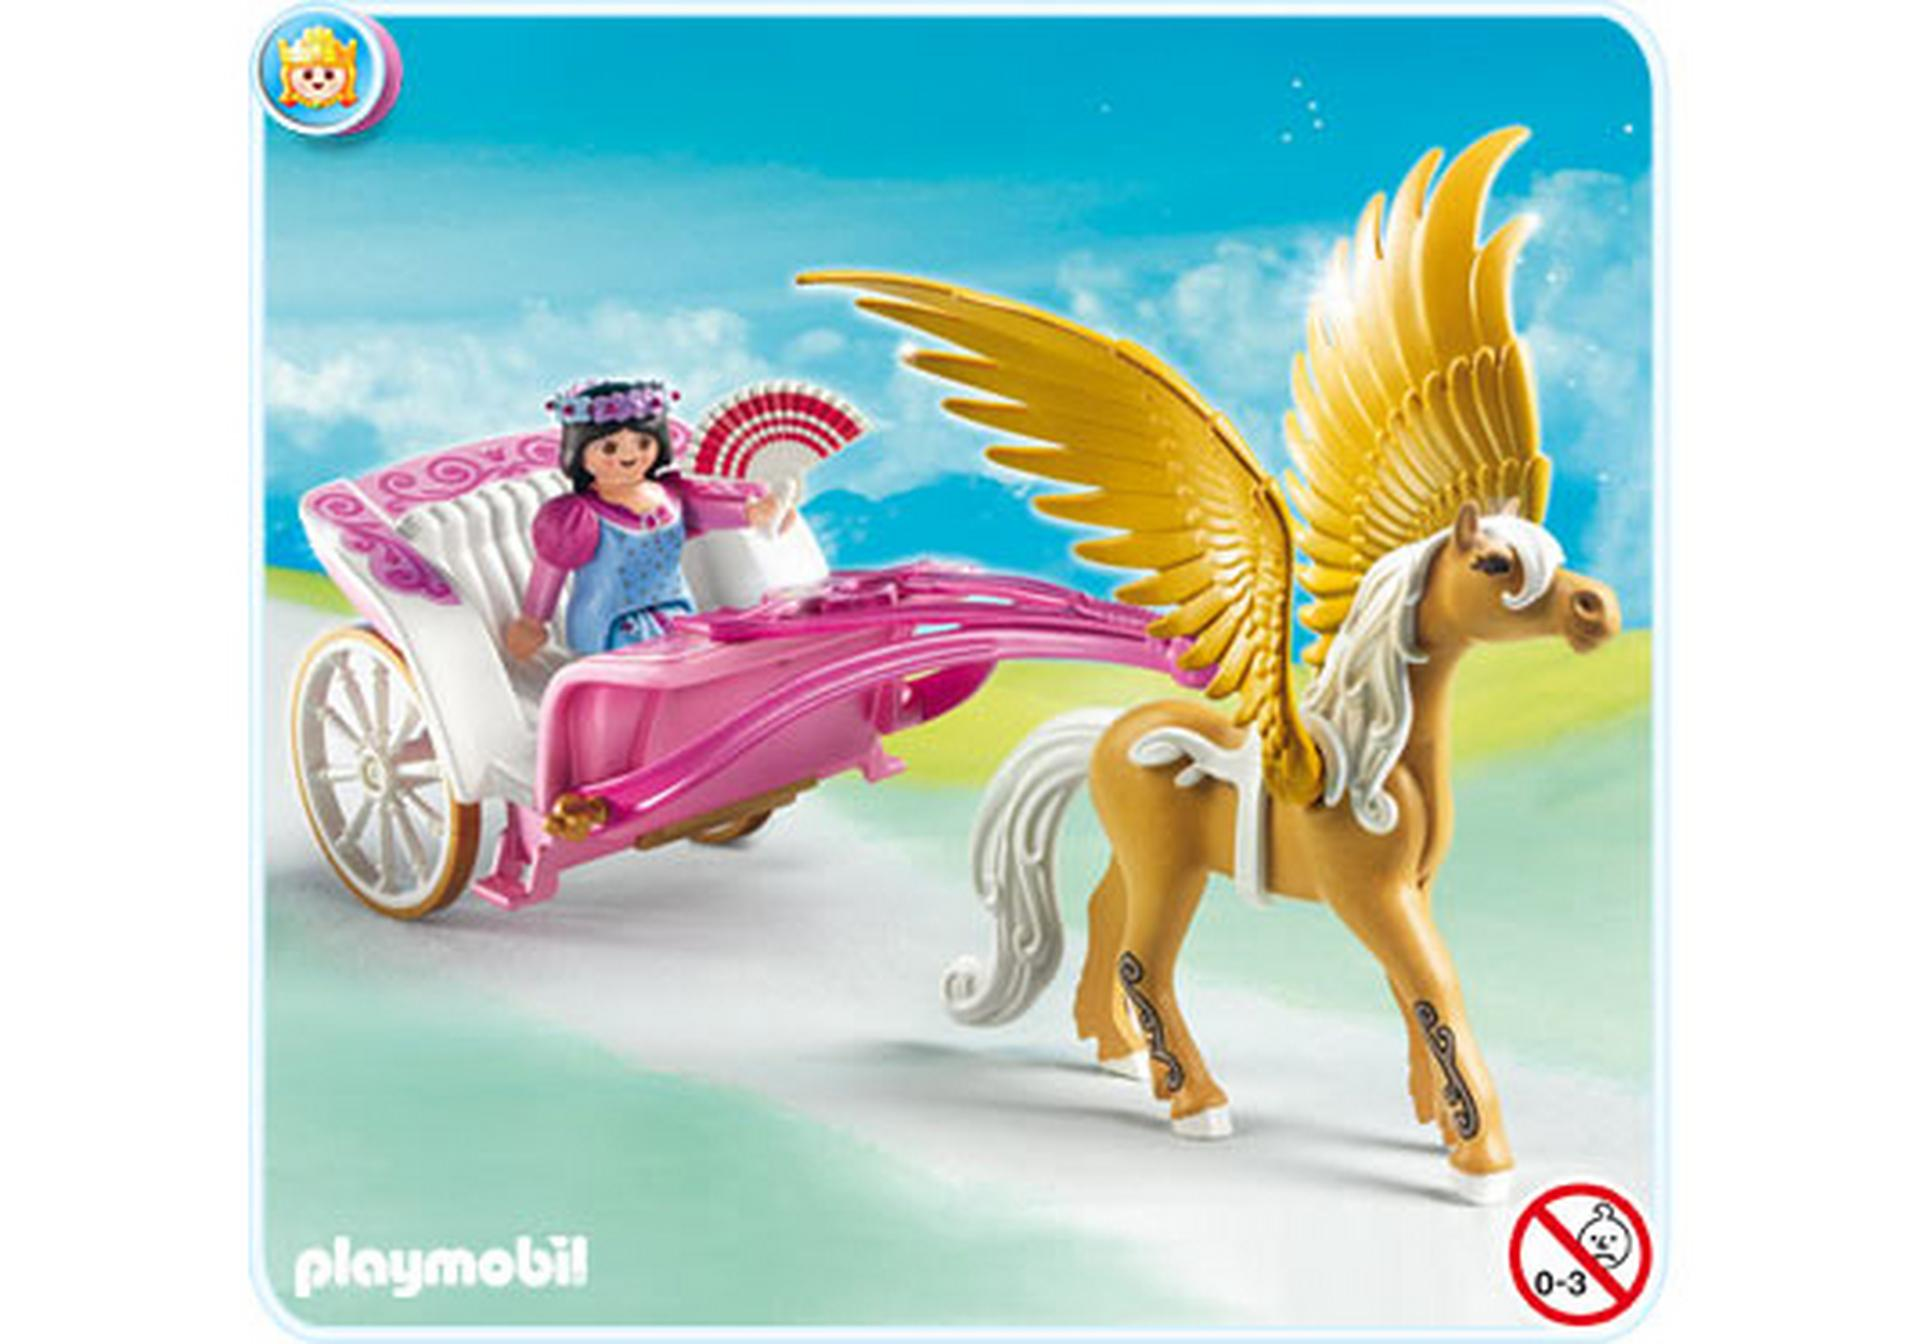 Pegasus kutsche 5143 a playmobil deutschland - Kutsche playmobil ...